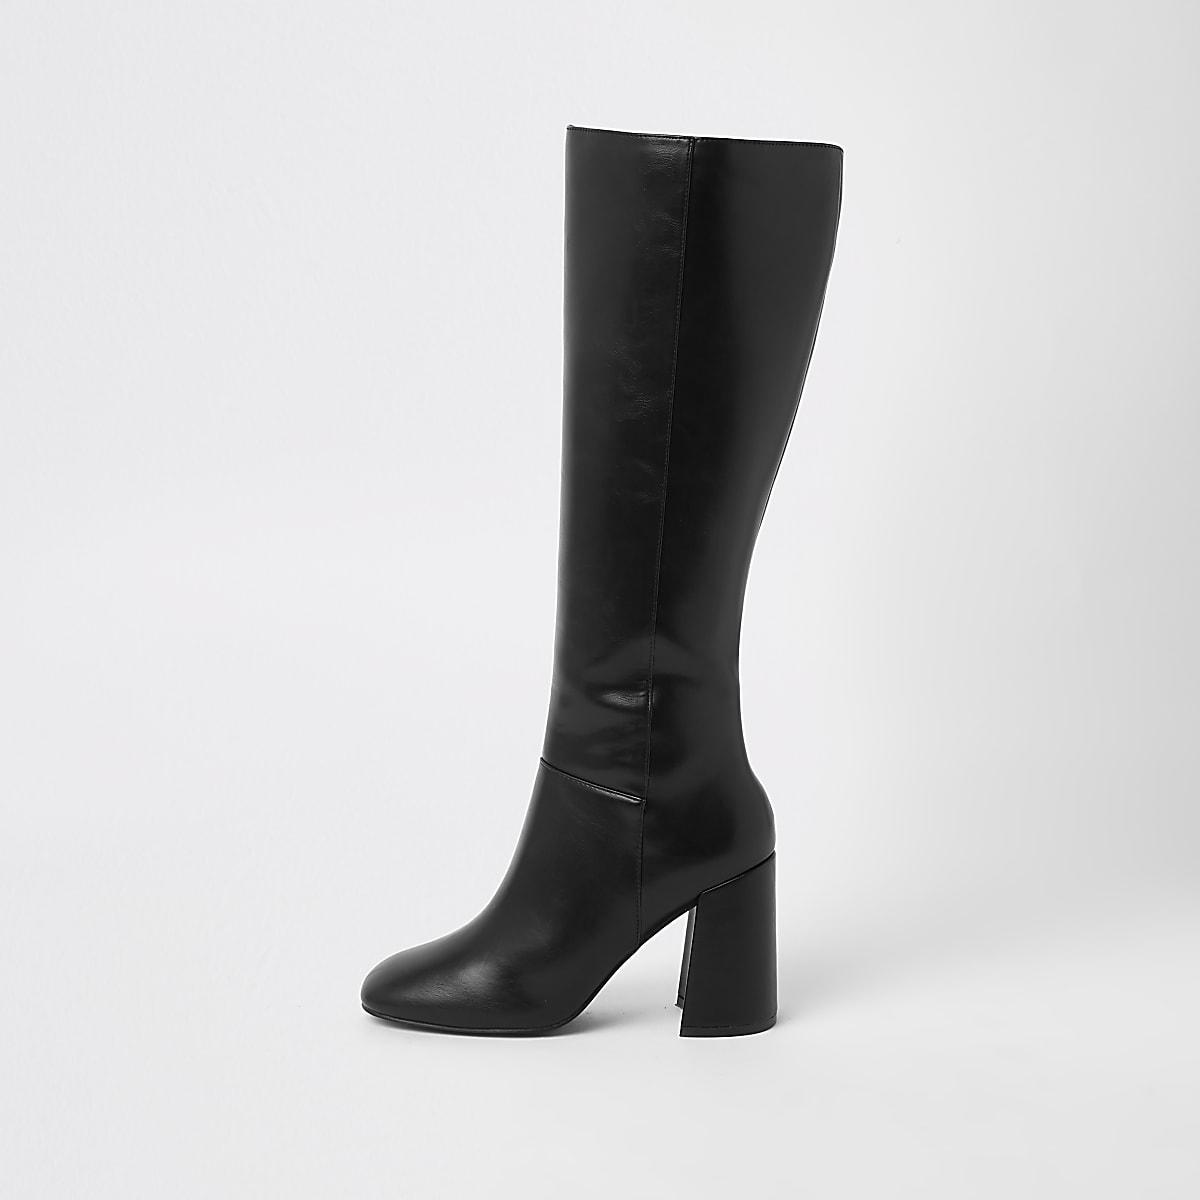 907818c2d413 Black block heel knee high boots - Boots - Shoes   Boots - women